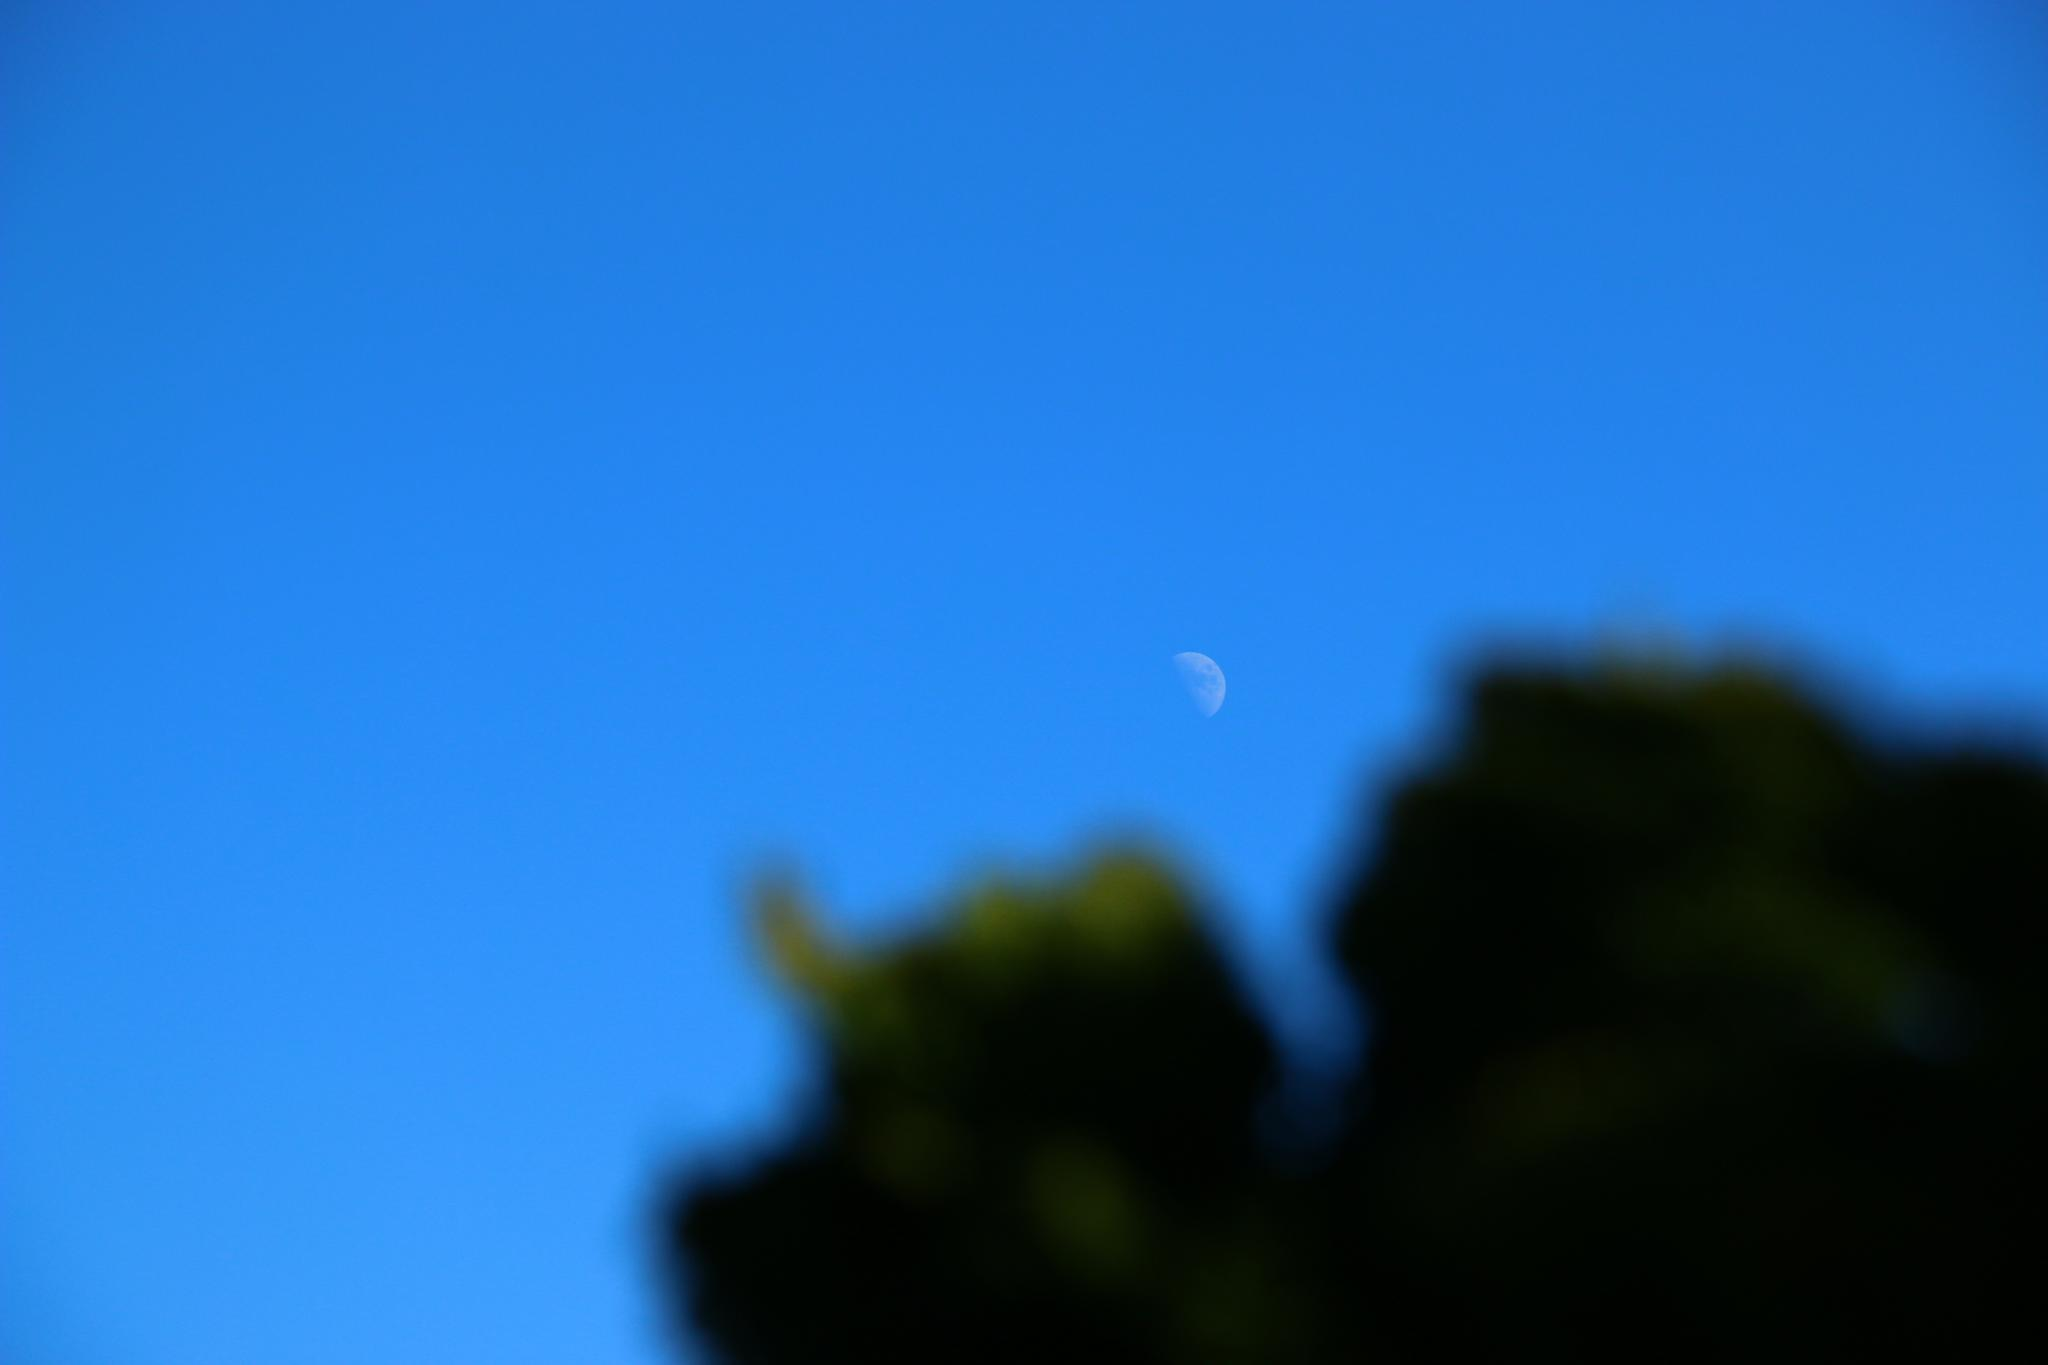 The moon in bright daylight by Karsten Larsen